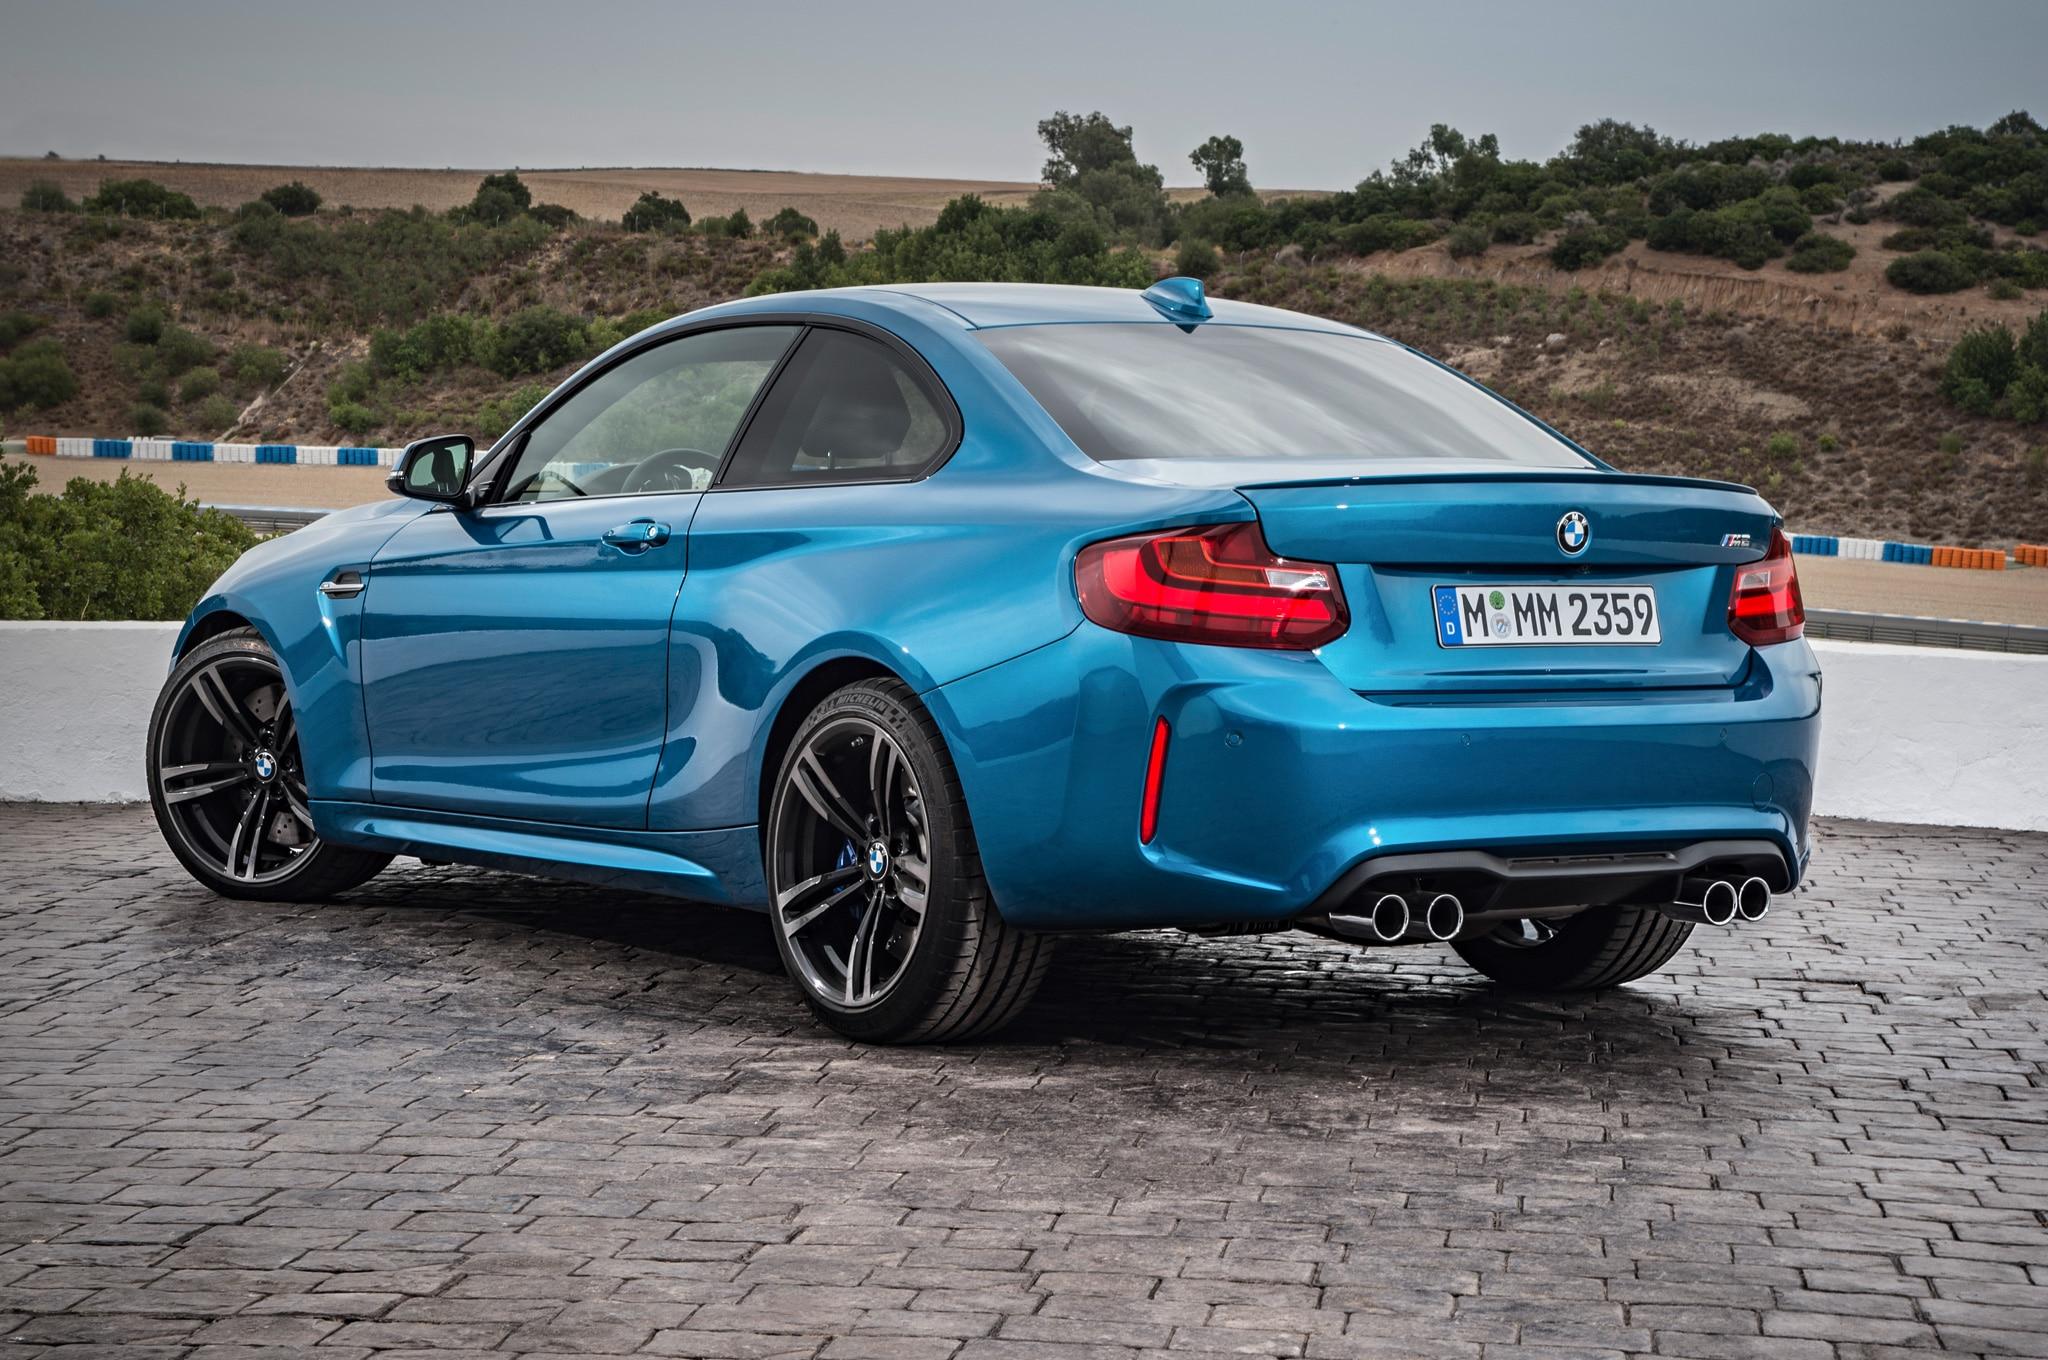 2016 BMW M2 Laps the Nurburgring in 758 Slower than Civic Type R